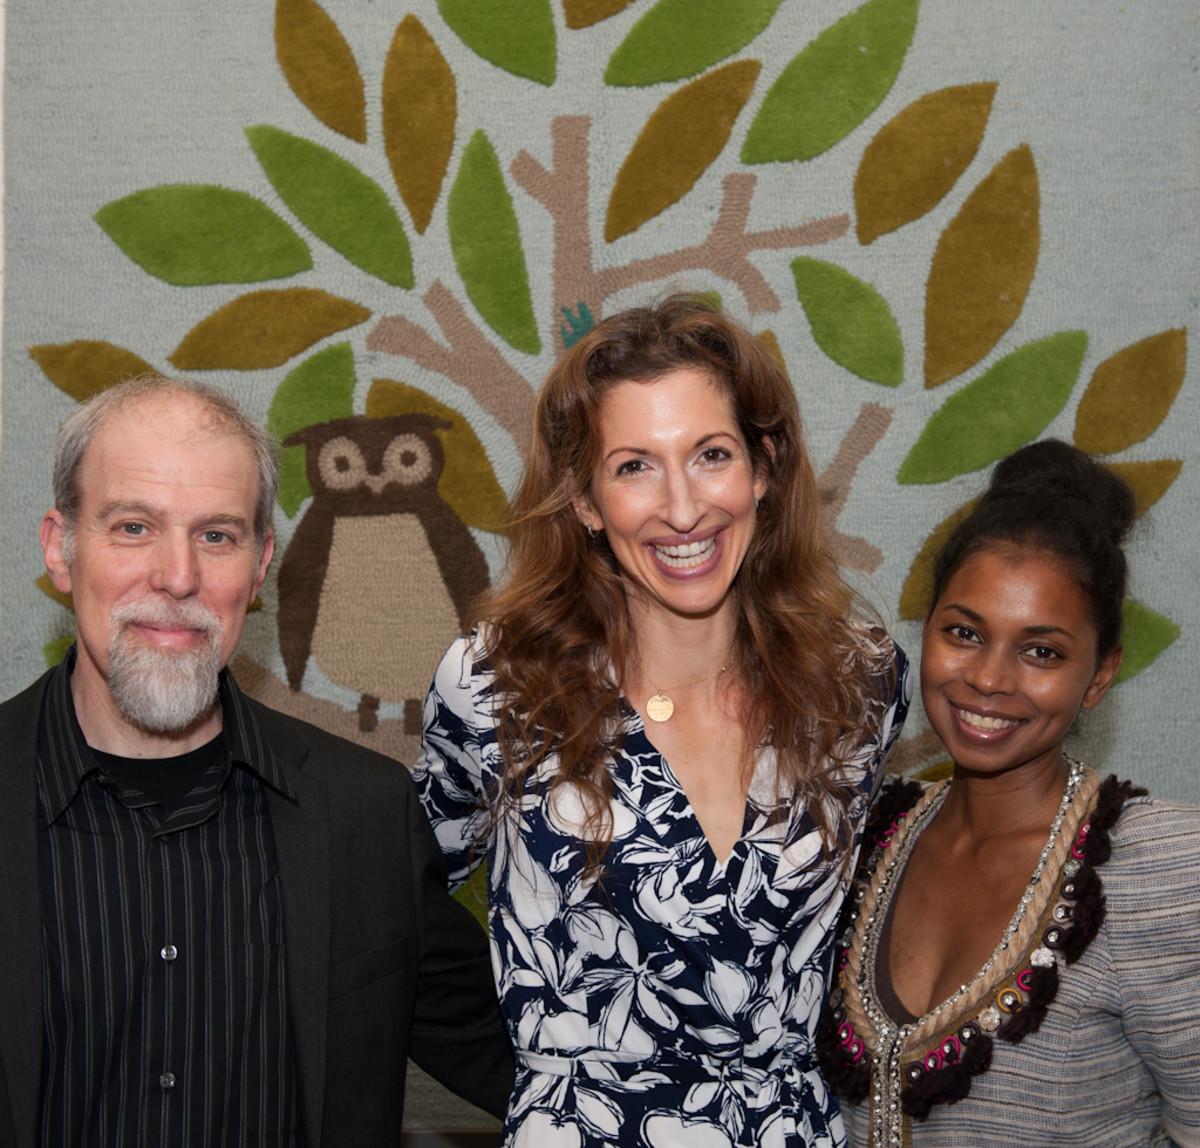 Dr. Stephen Cowan, Alysia Reiner, Penelope Jagessar Chaffer